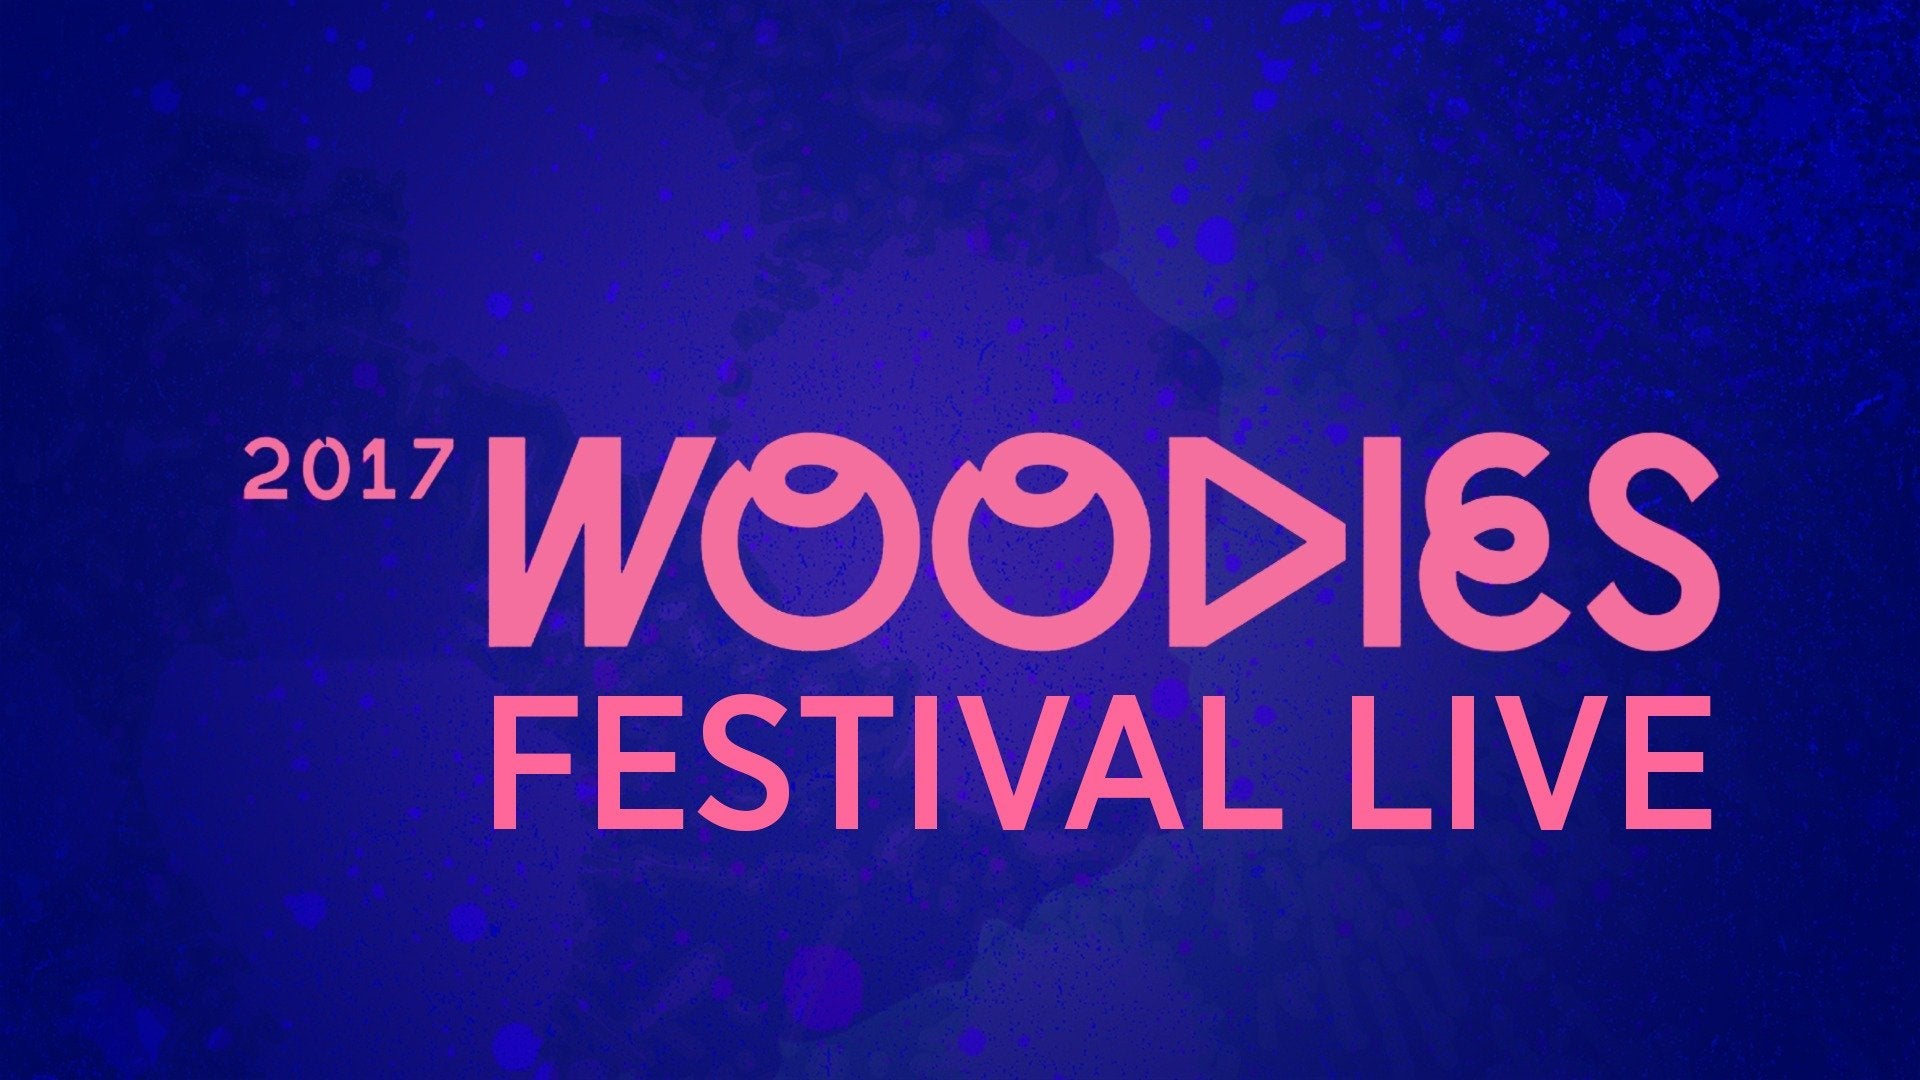 2017 Woodies Festival Live